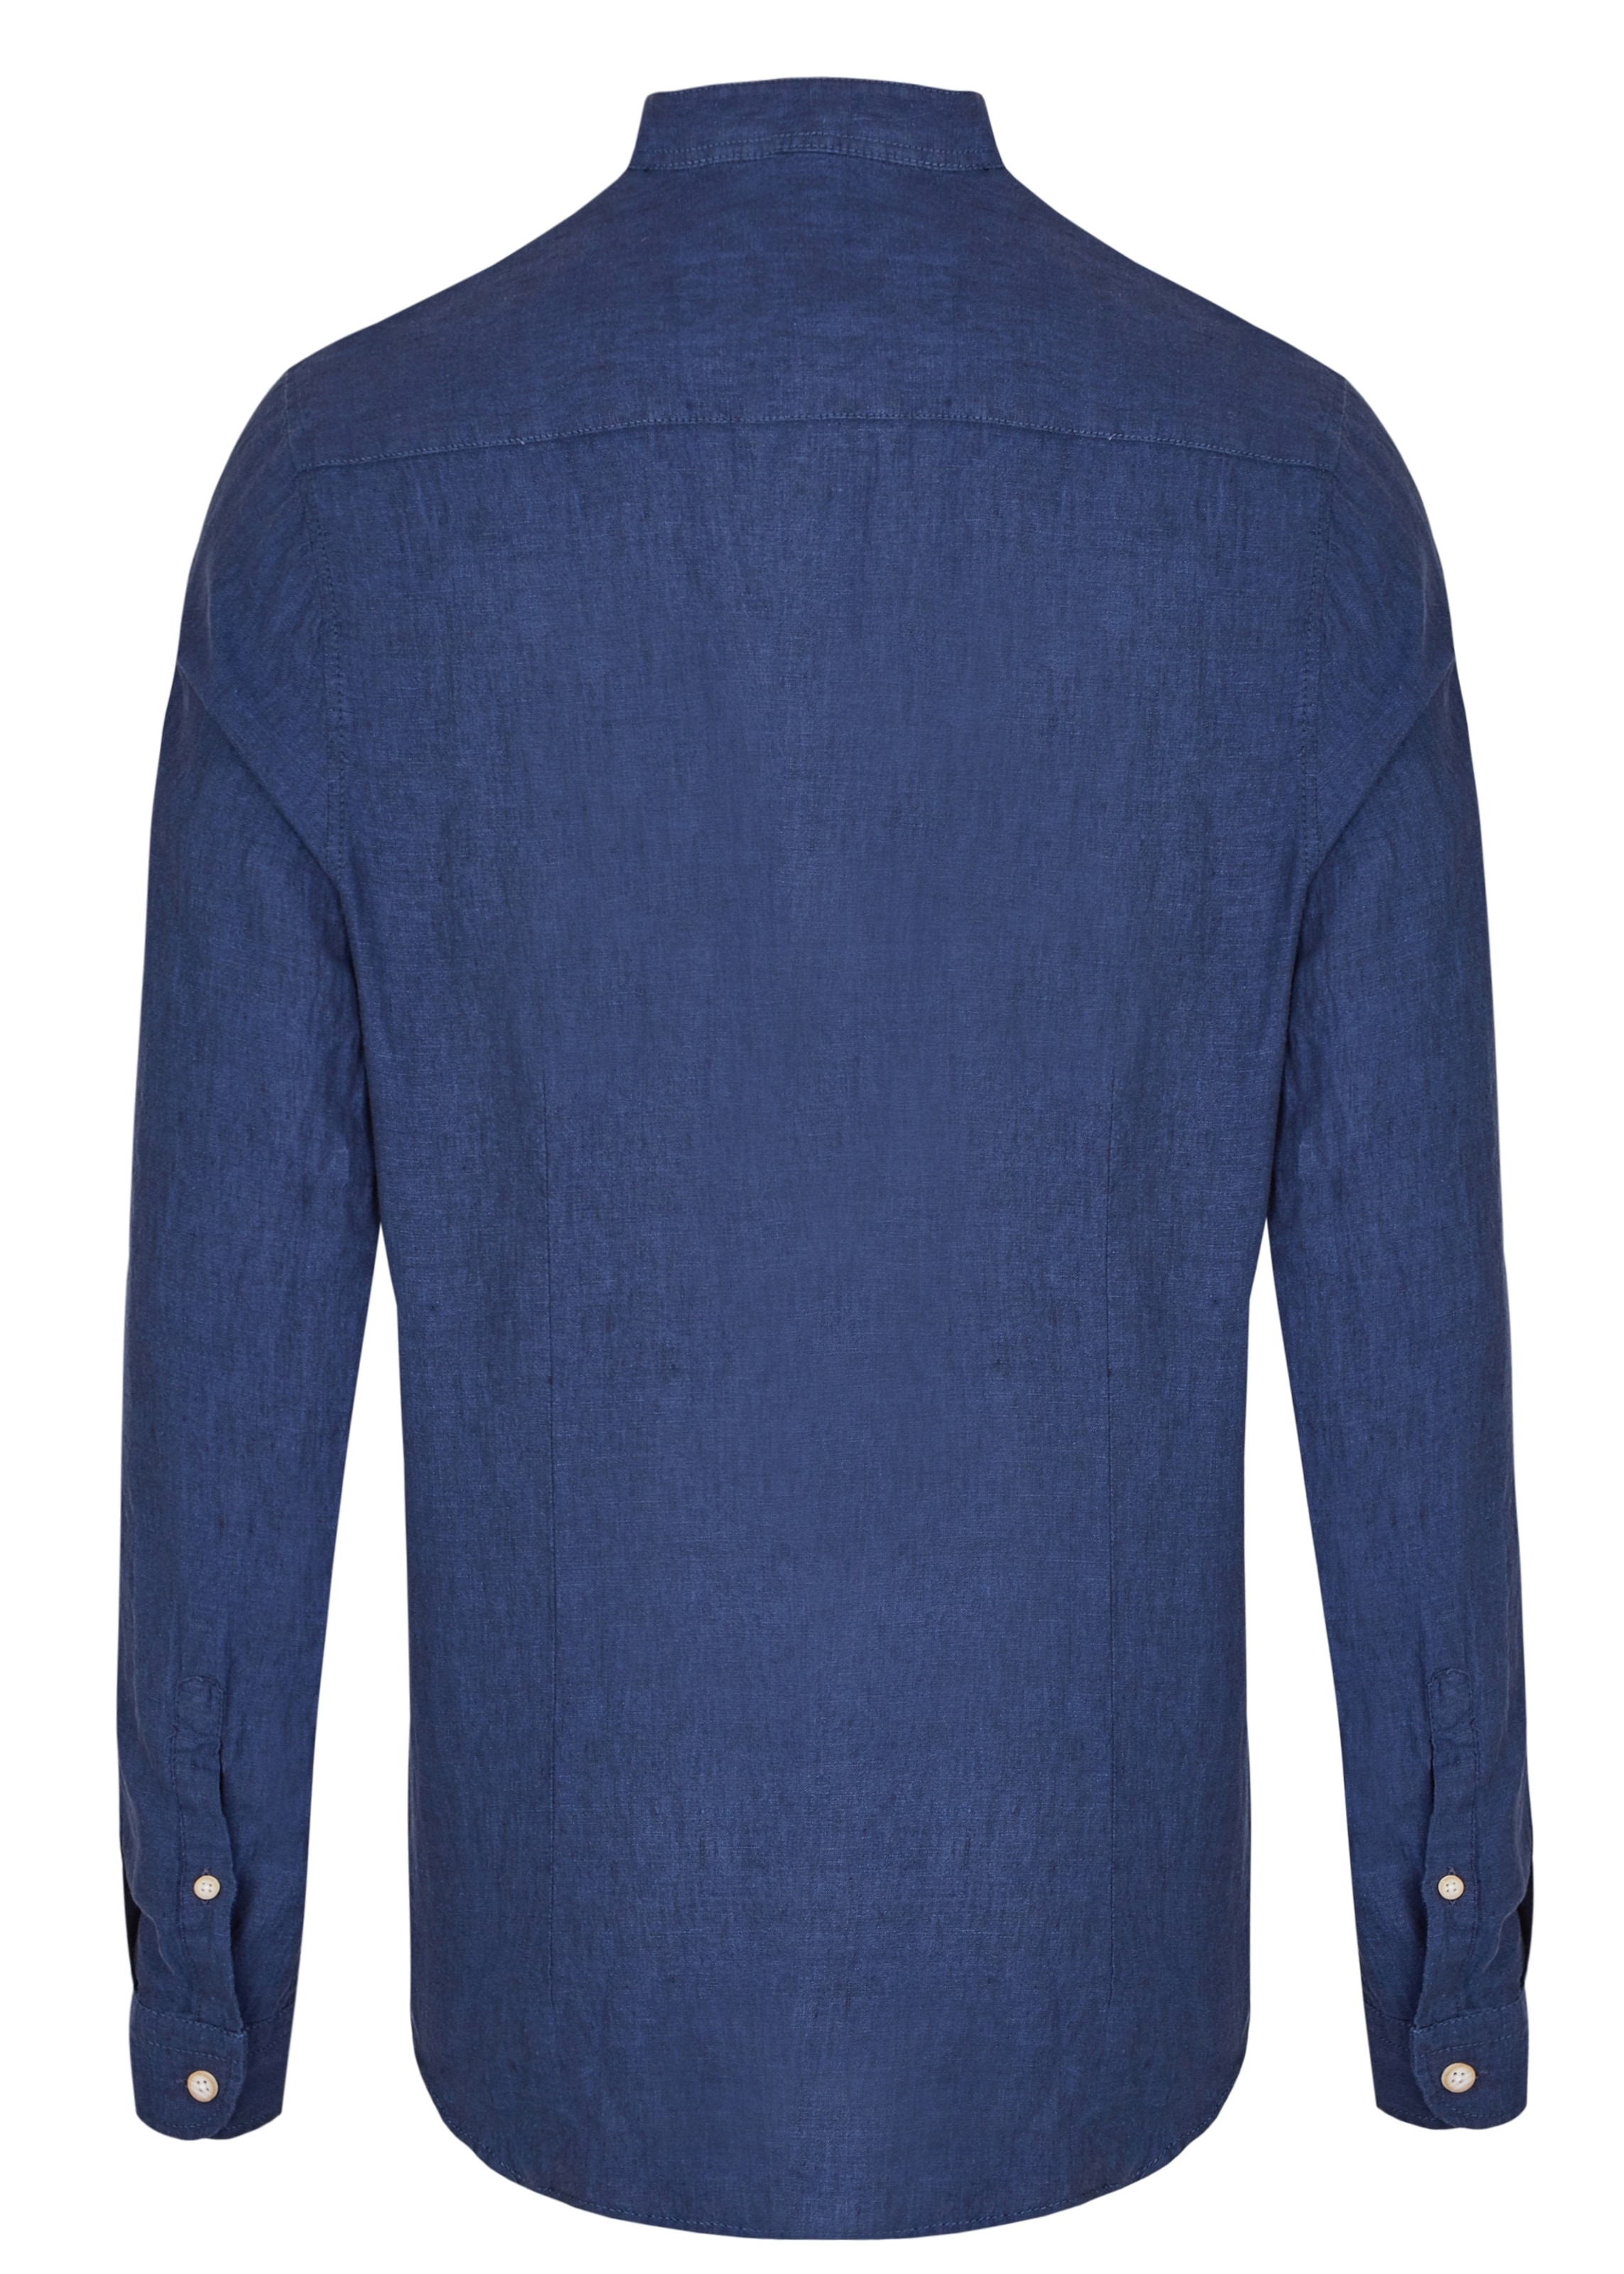 Marine Pure Pure In Pure Herrenhemd In Herrenhemd In Marine Herrenhemd Marine 7fb6gy